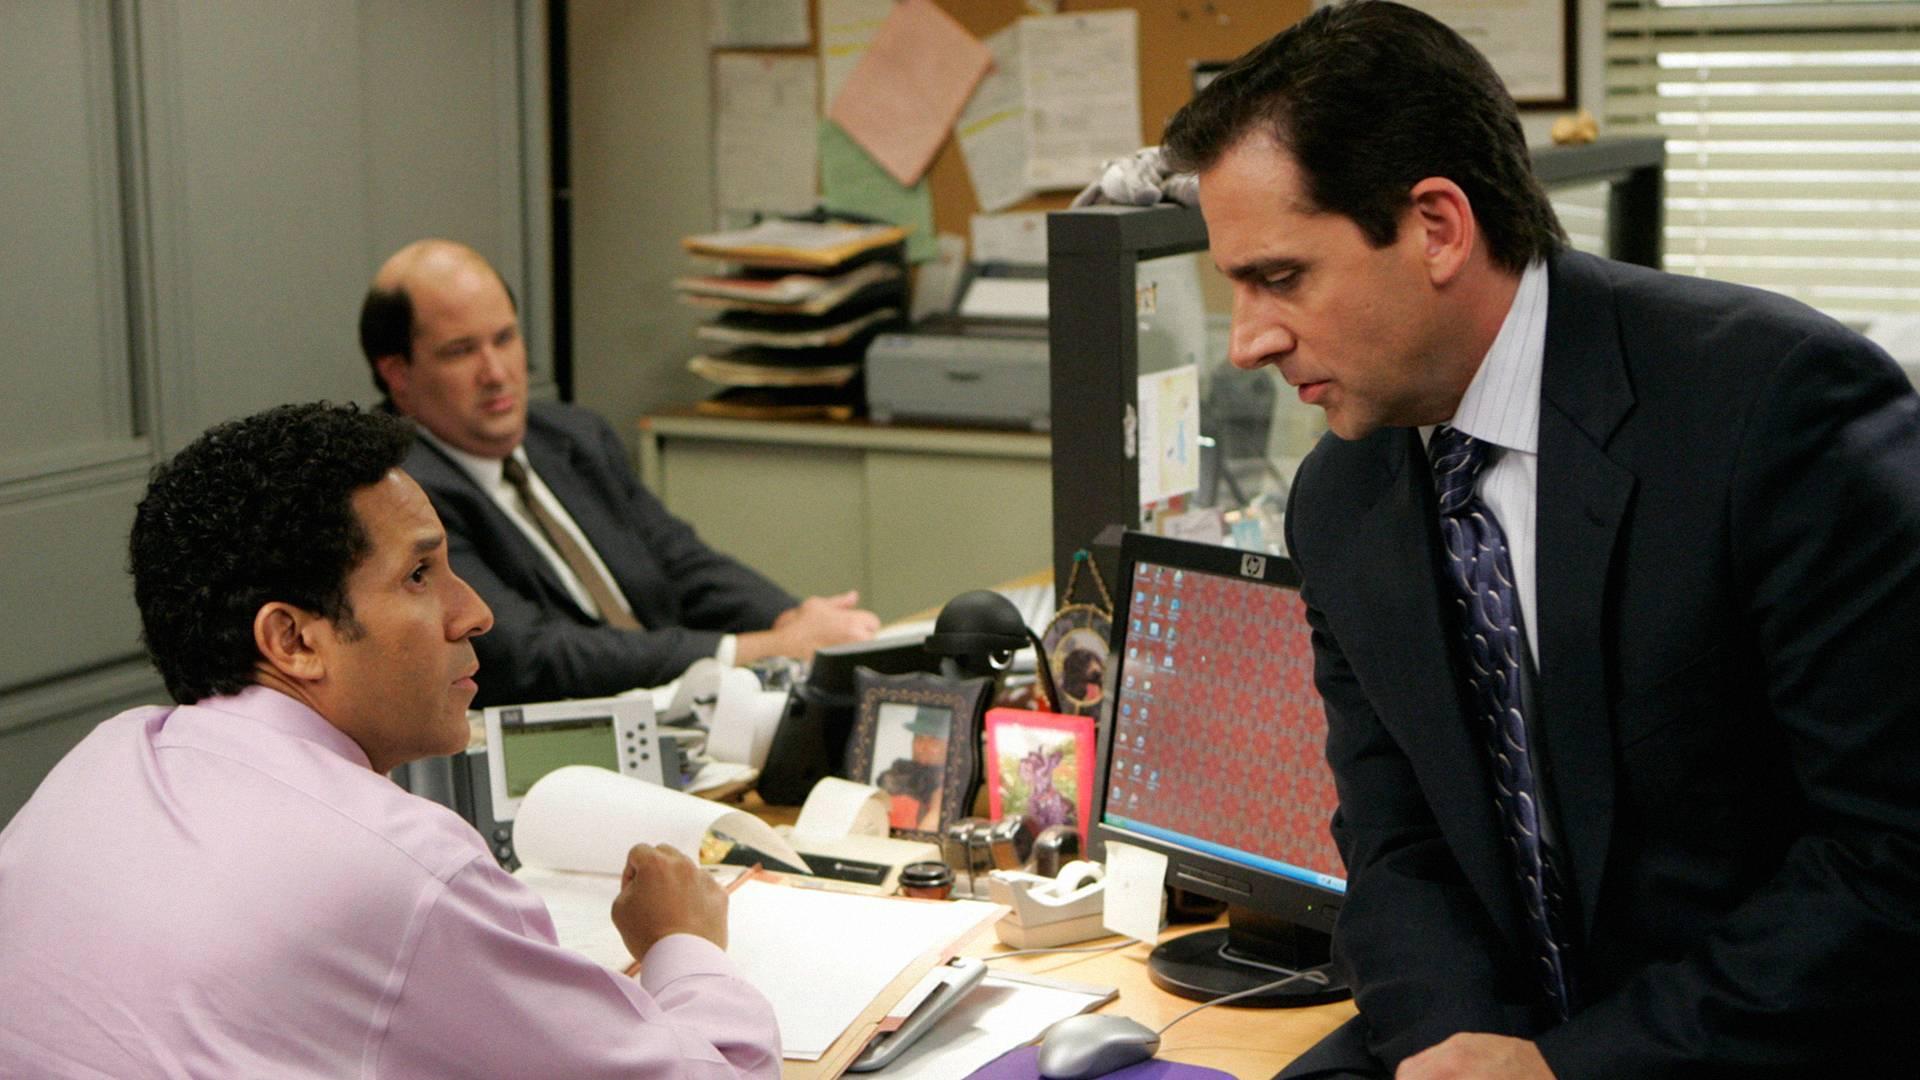 The Office Season 4 Episode 14